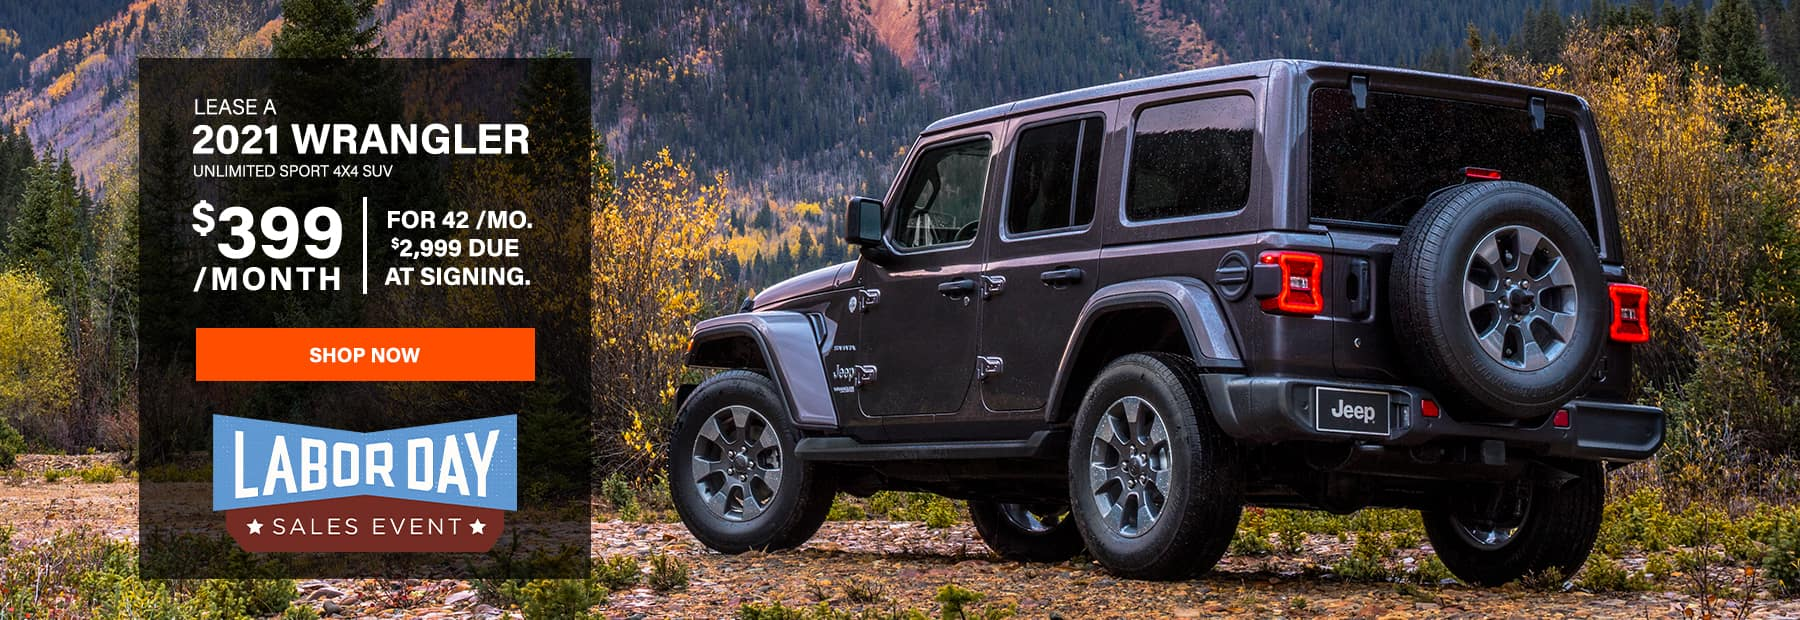 2021-09-02 Jeep Wrangler Desktop